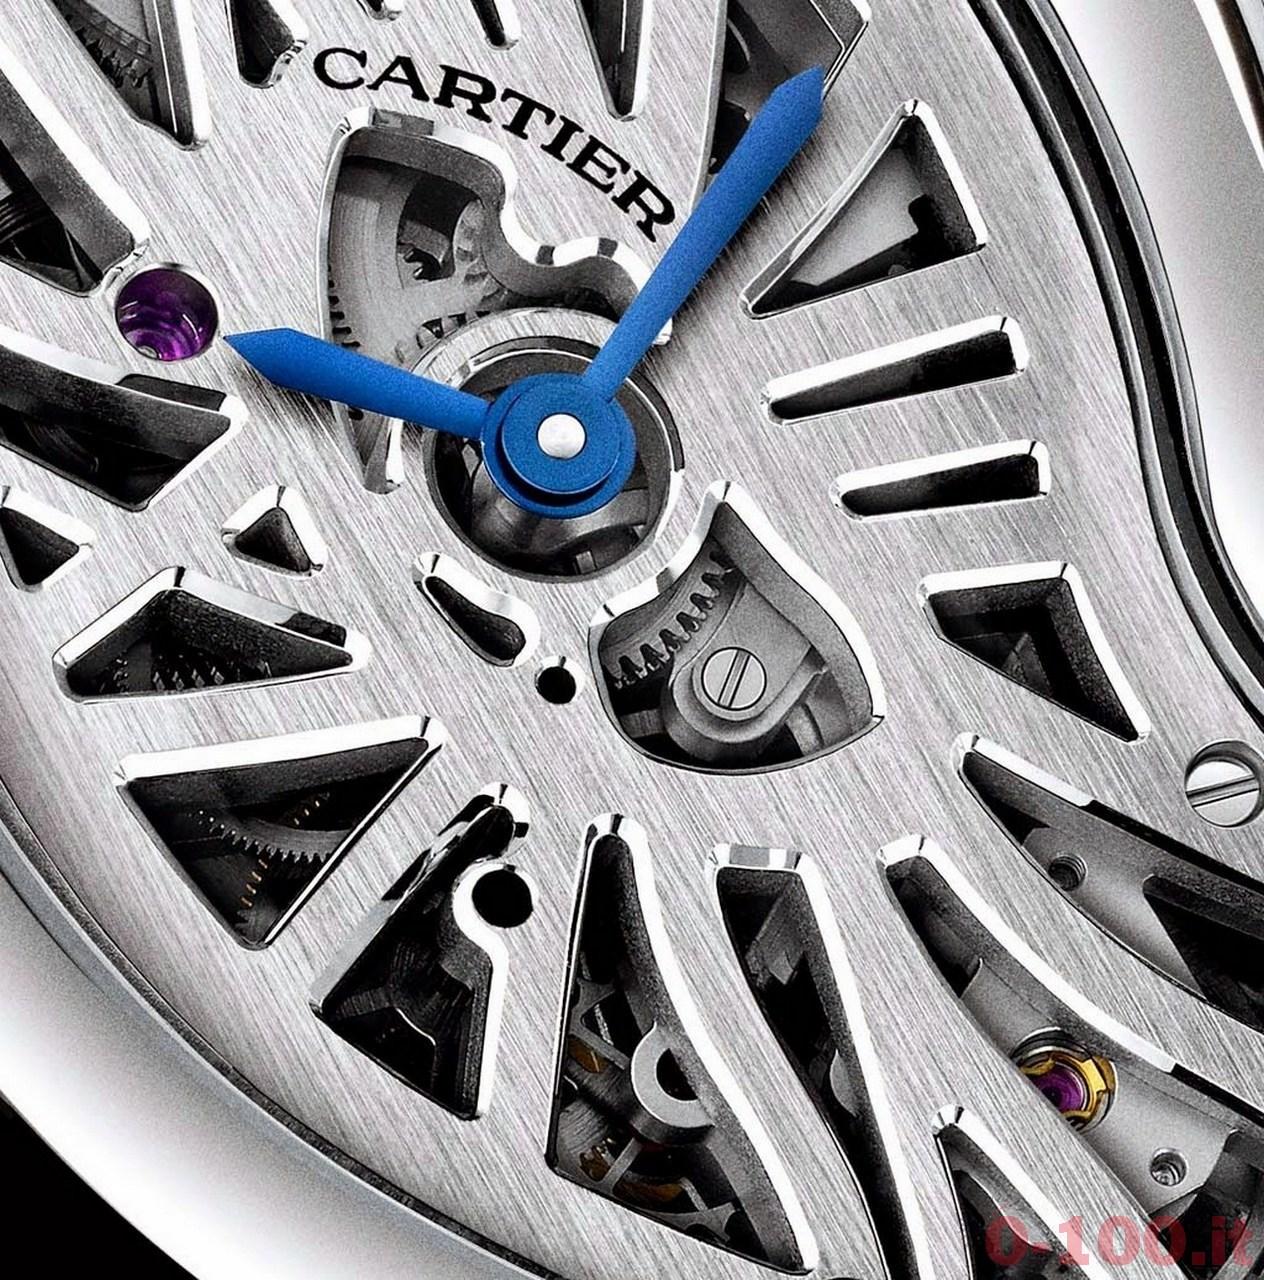 anteprima-sihh-2015-cartier-crash-skeleton-prezzo-price-0-100_2